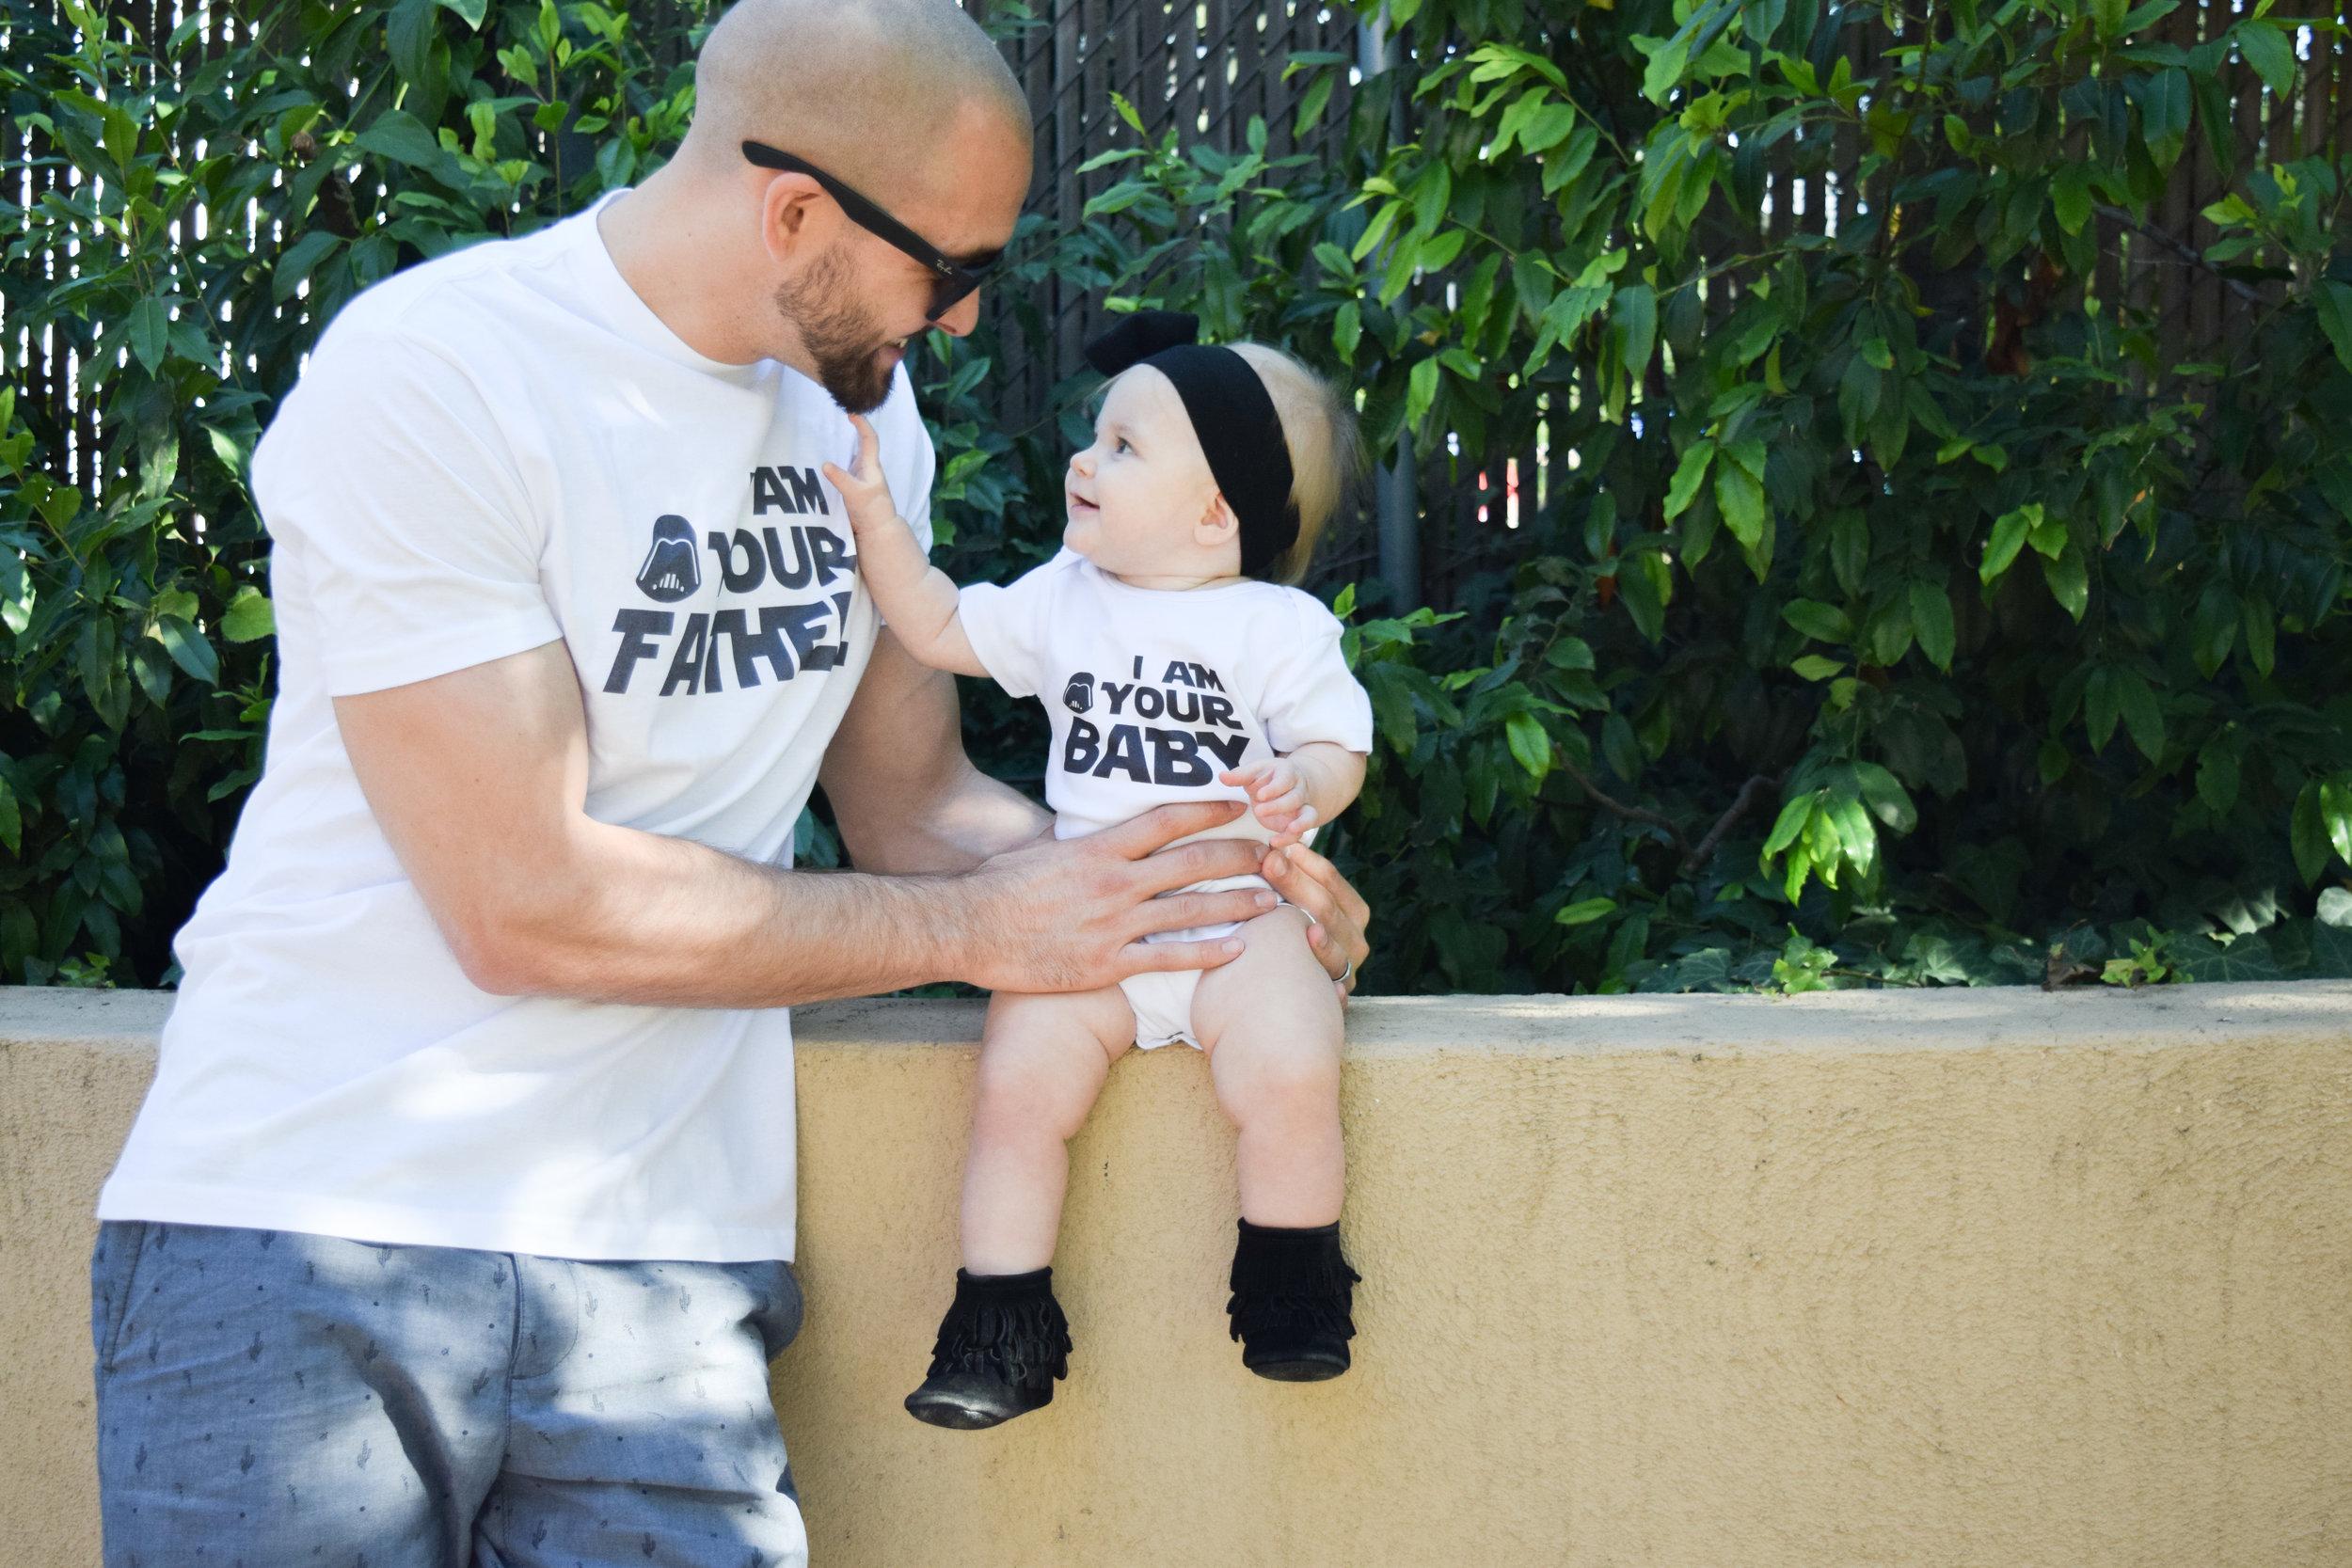 Star Wars Themed Baby Onesie + Daddy Shirt - Daddy/Baby Shirts